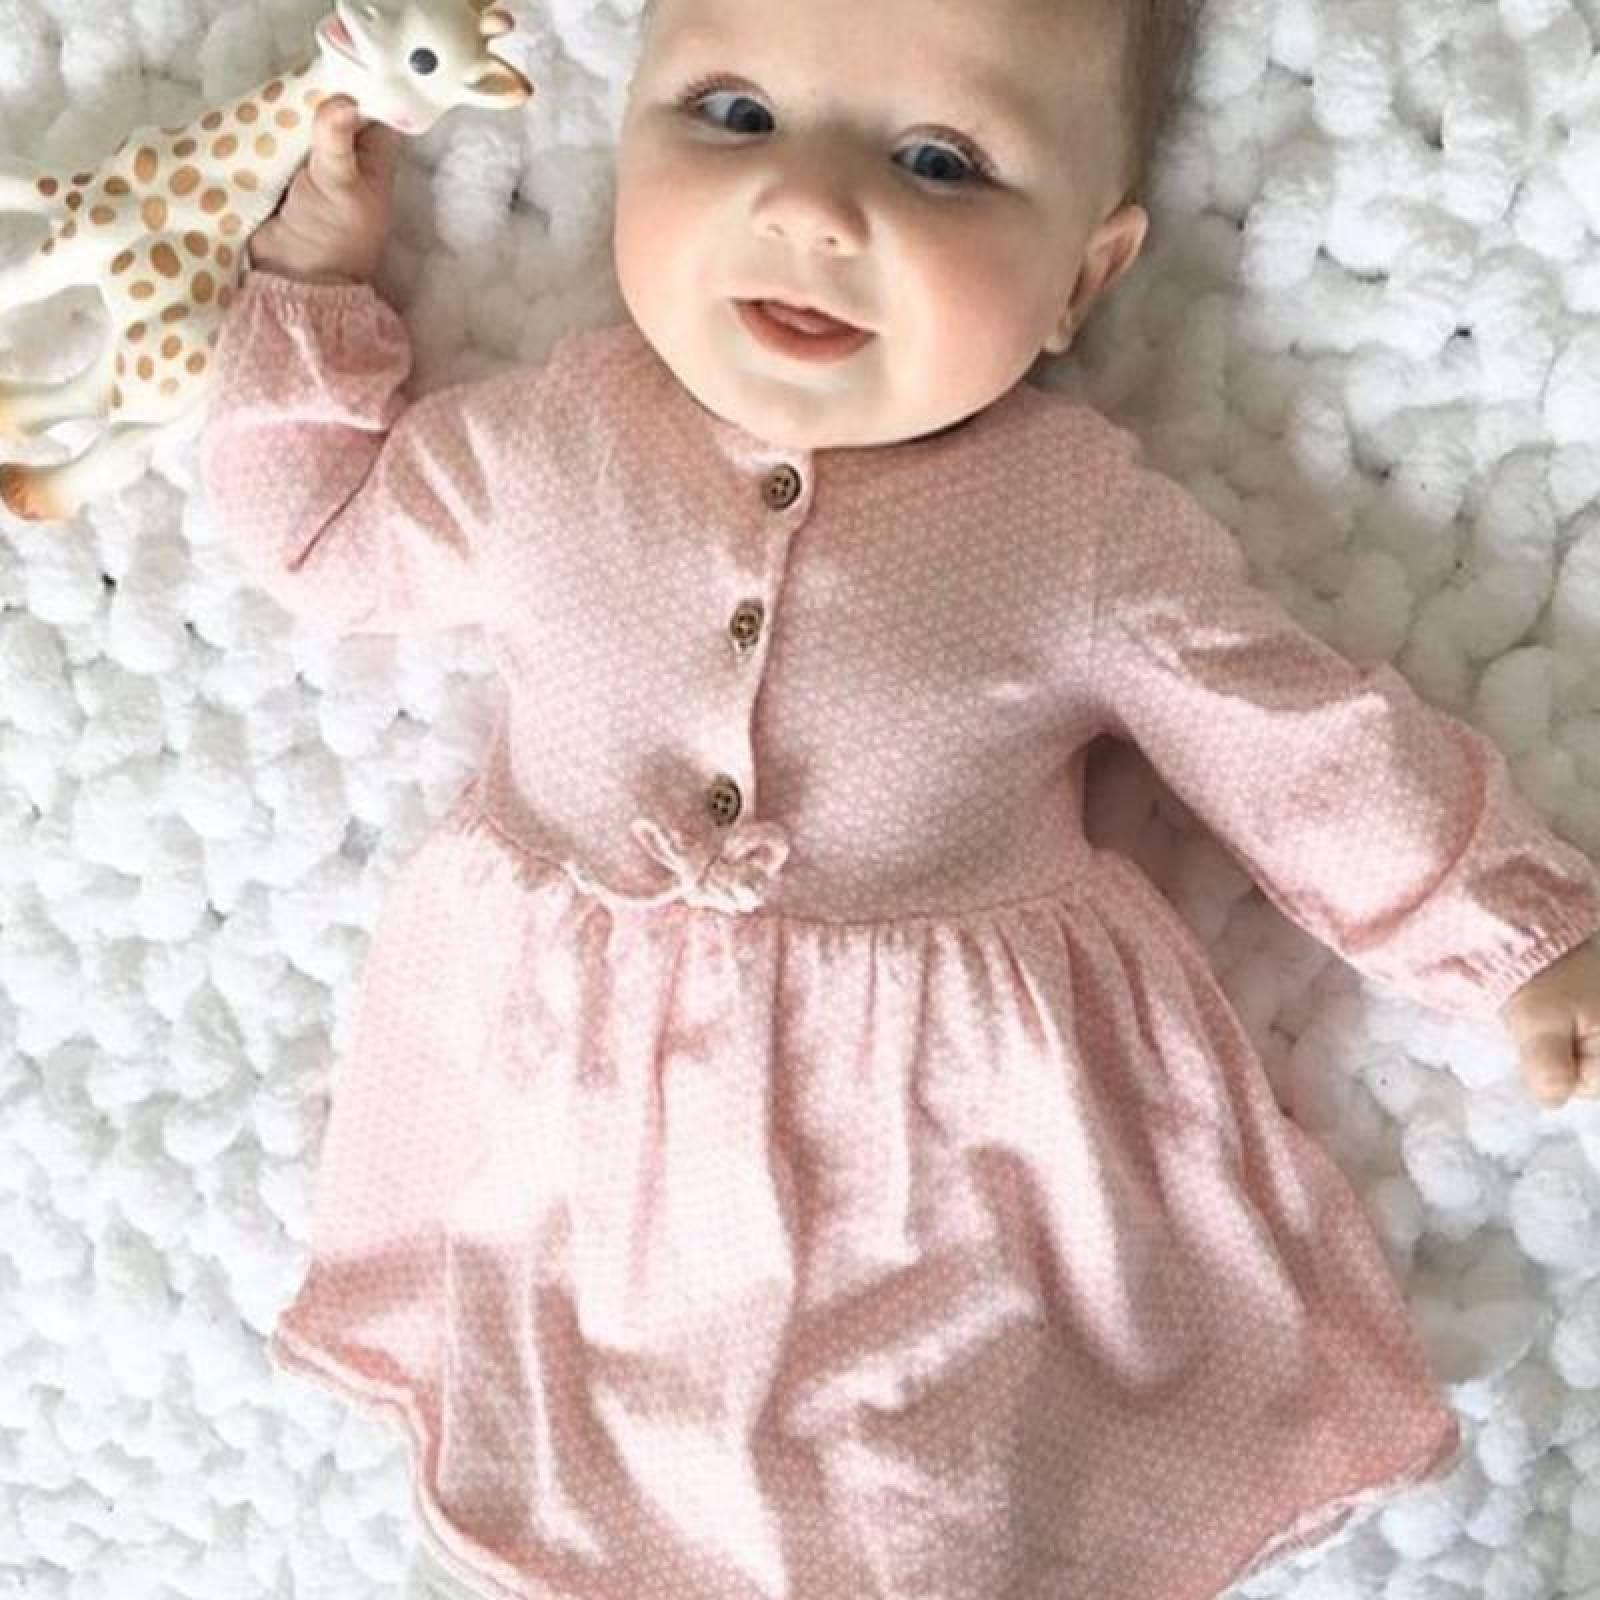 Sophie the Giraffe - Sophie la Girafe Baby Squeaker Teething Toy thumbnails